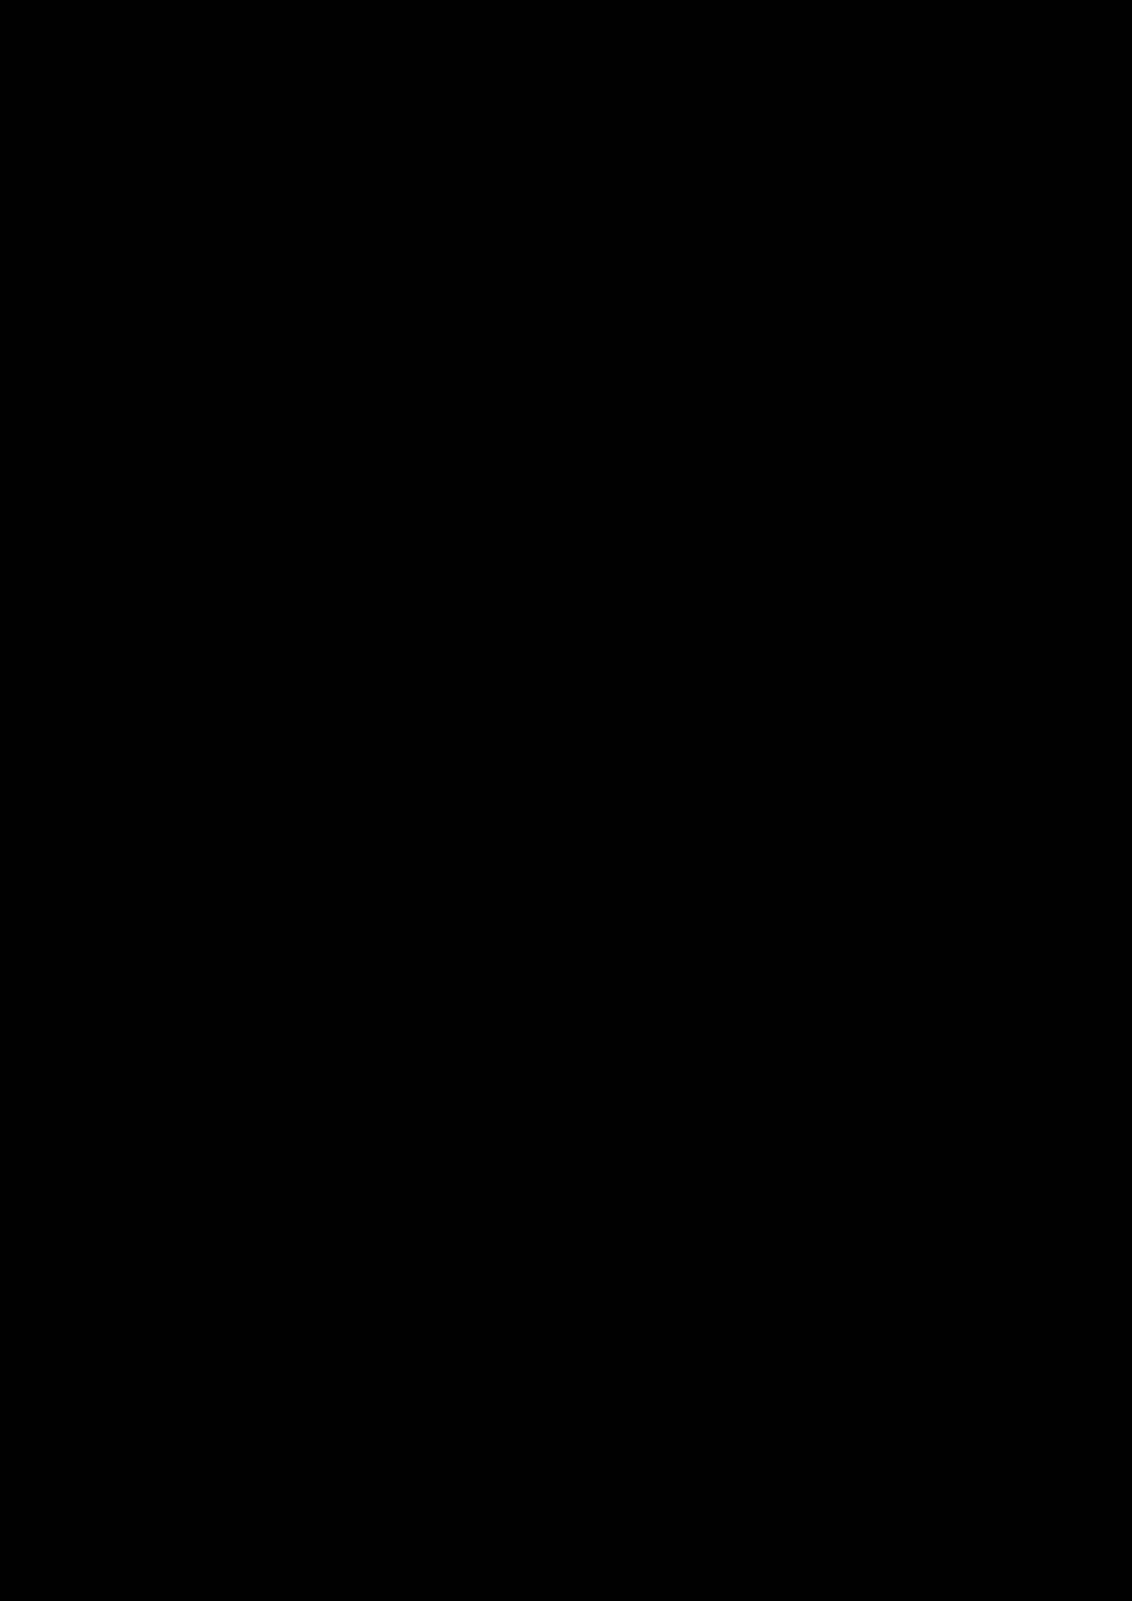 Okean Pustotyi slide, Image 12